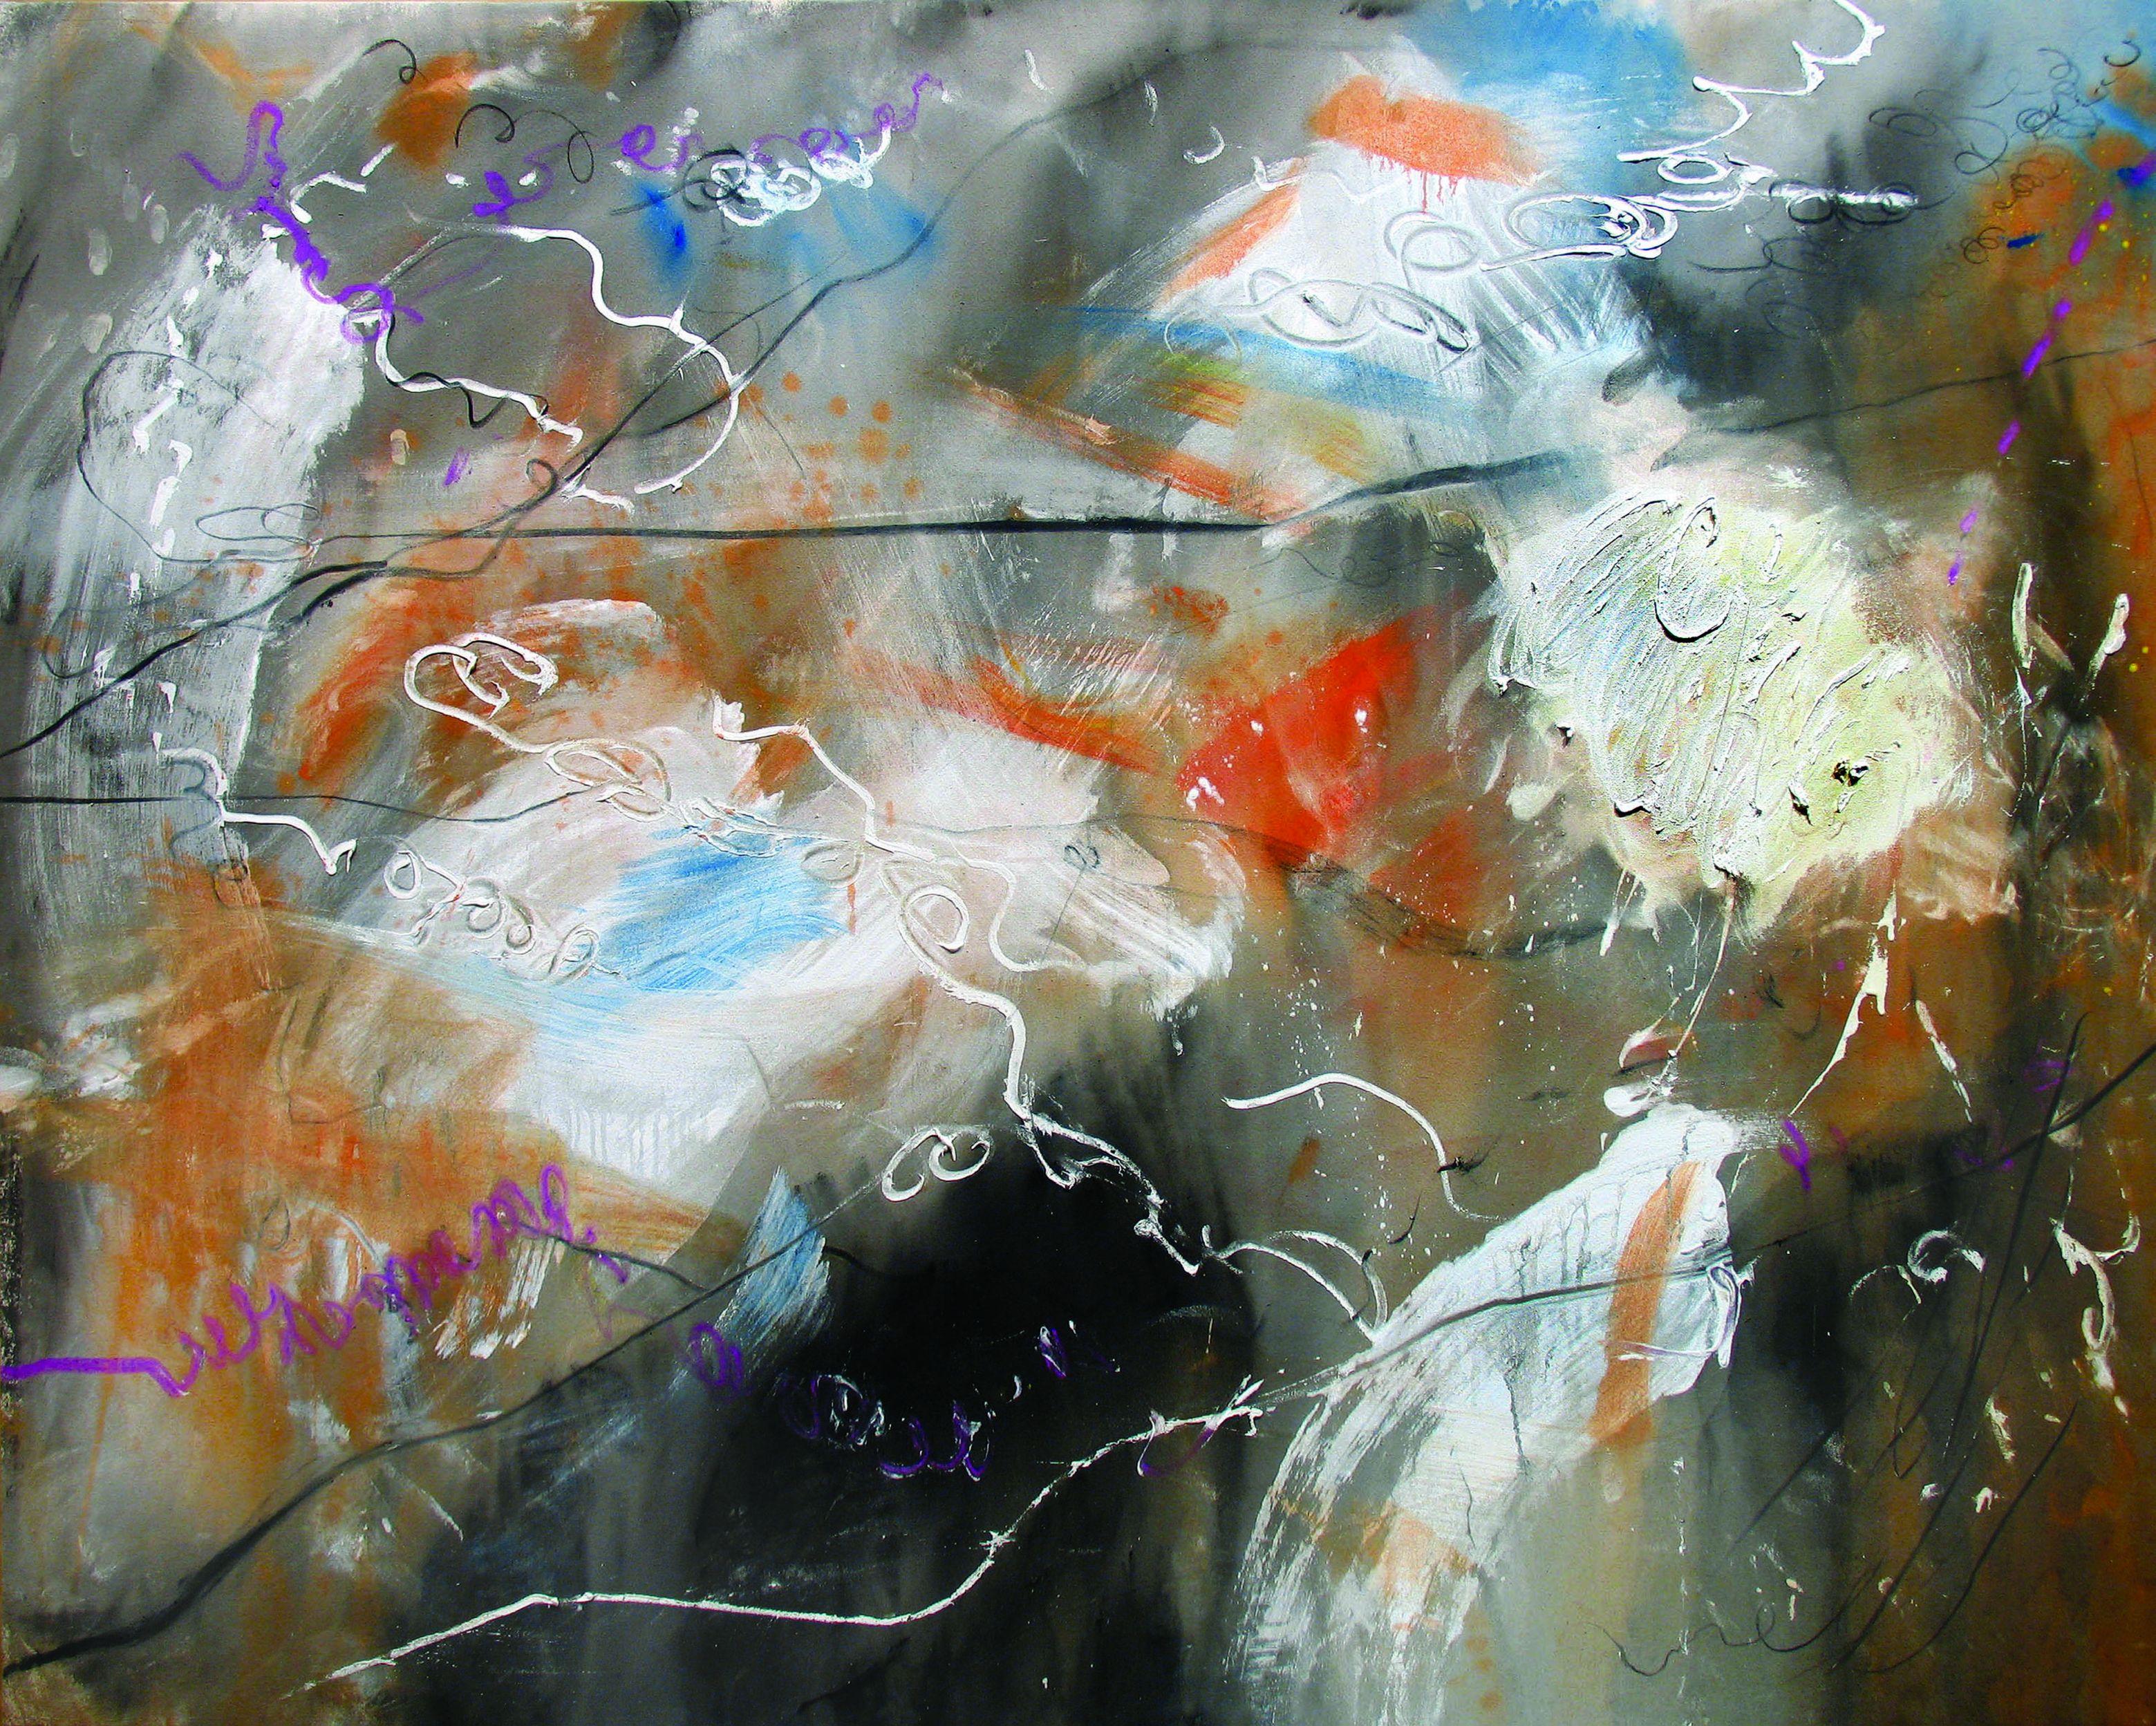 """Sagitario"" sobre ""La Constellation du Sagittaire"" de la obra musical ""Éclairs sur l'au-delà…"" de Olivier Messiaen (2008) - Arturo Martín Burgos"